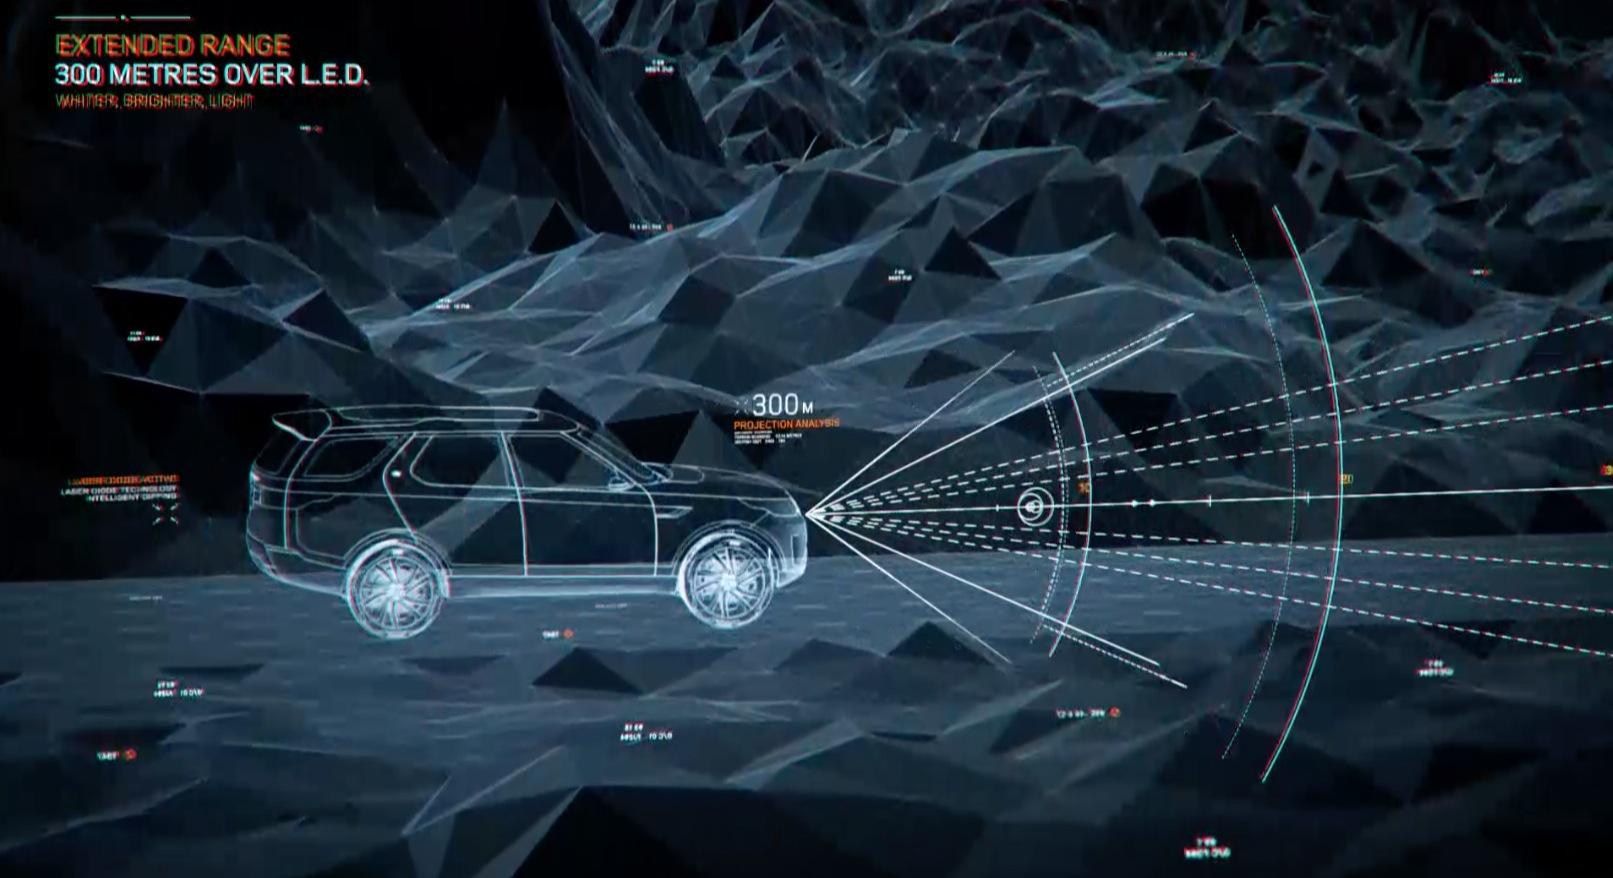 LR-Discovery_Vision-tech2.jg